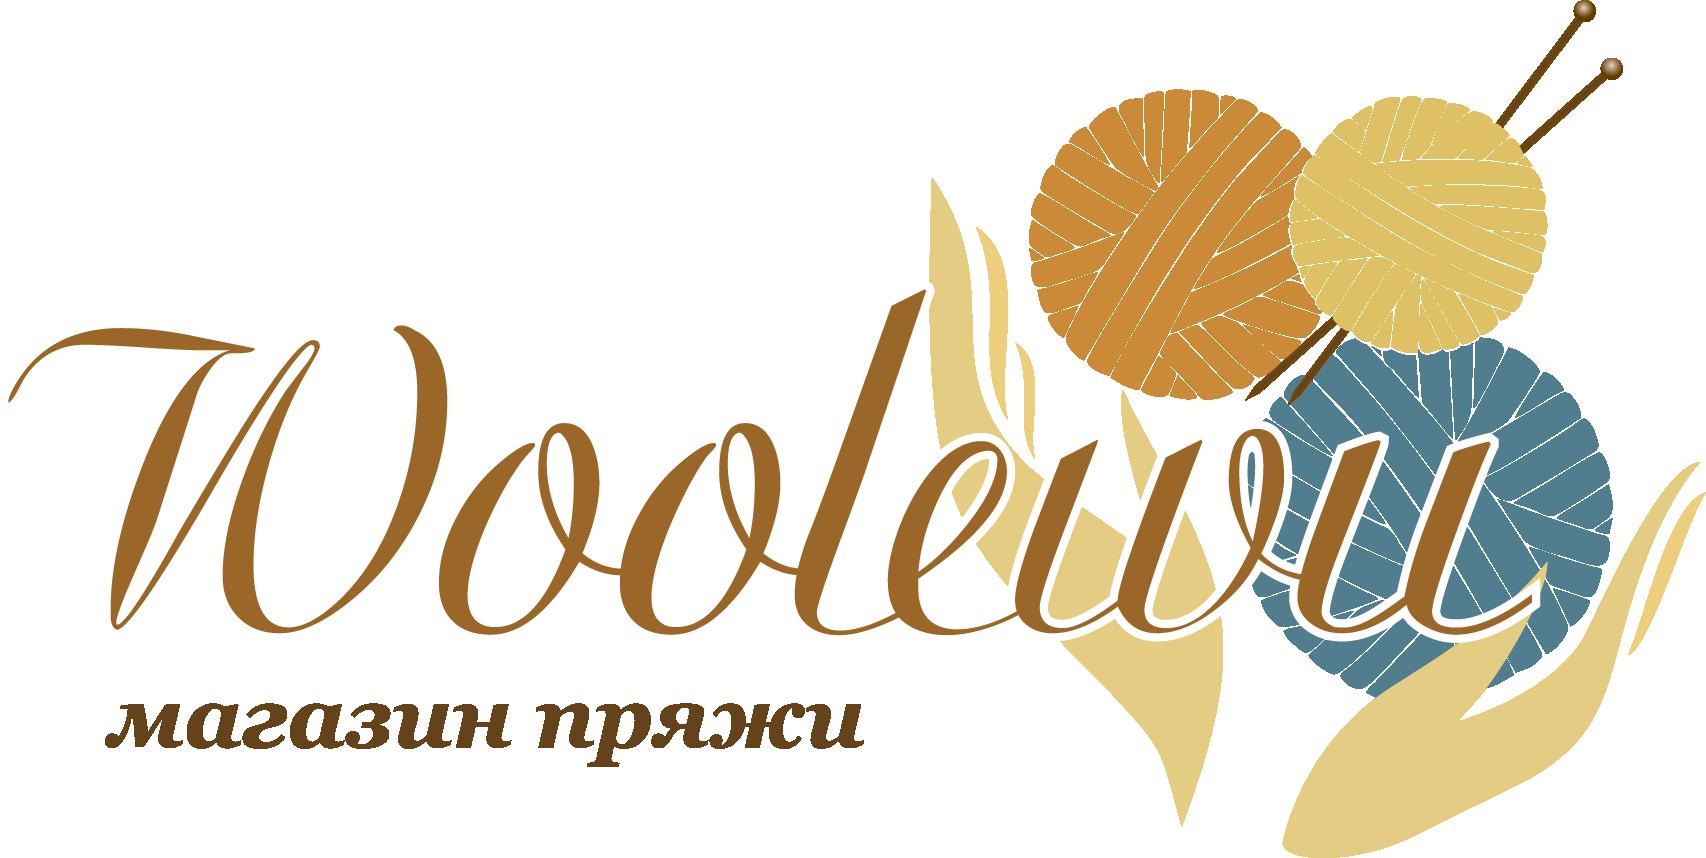 Woolewu_OK-01_rms_03102018.png